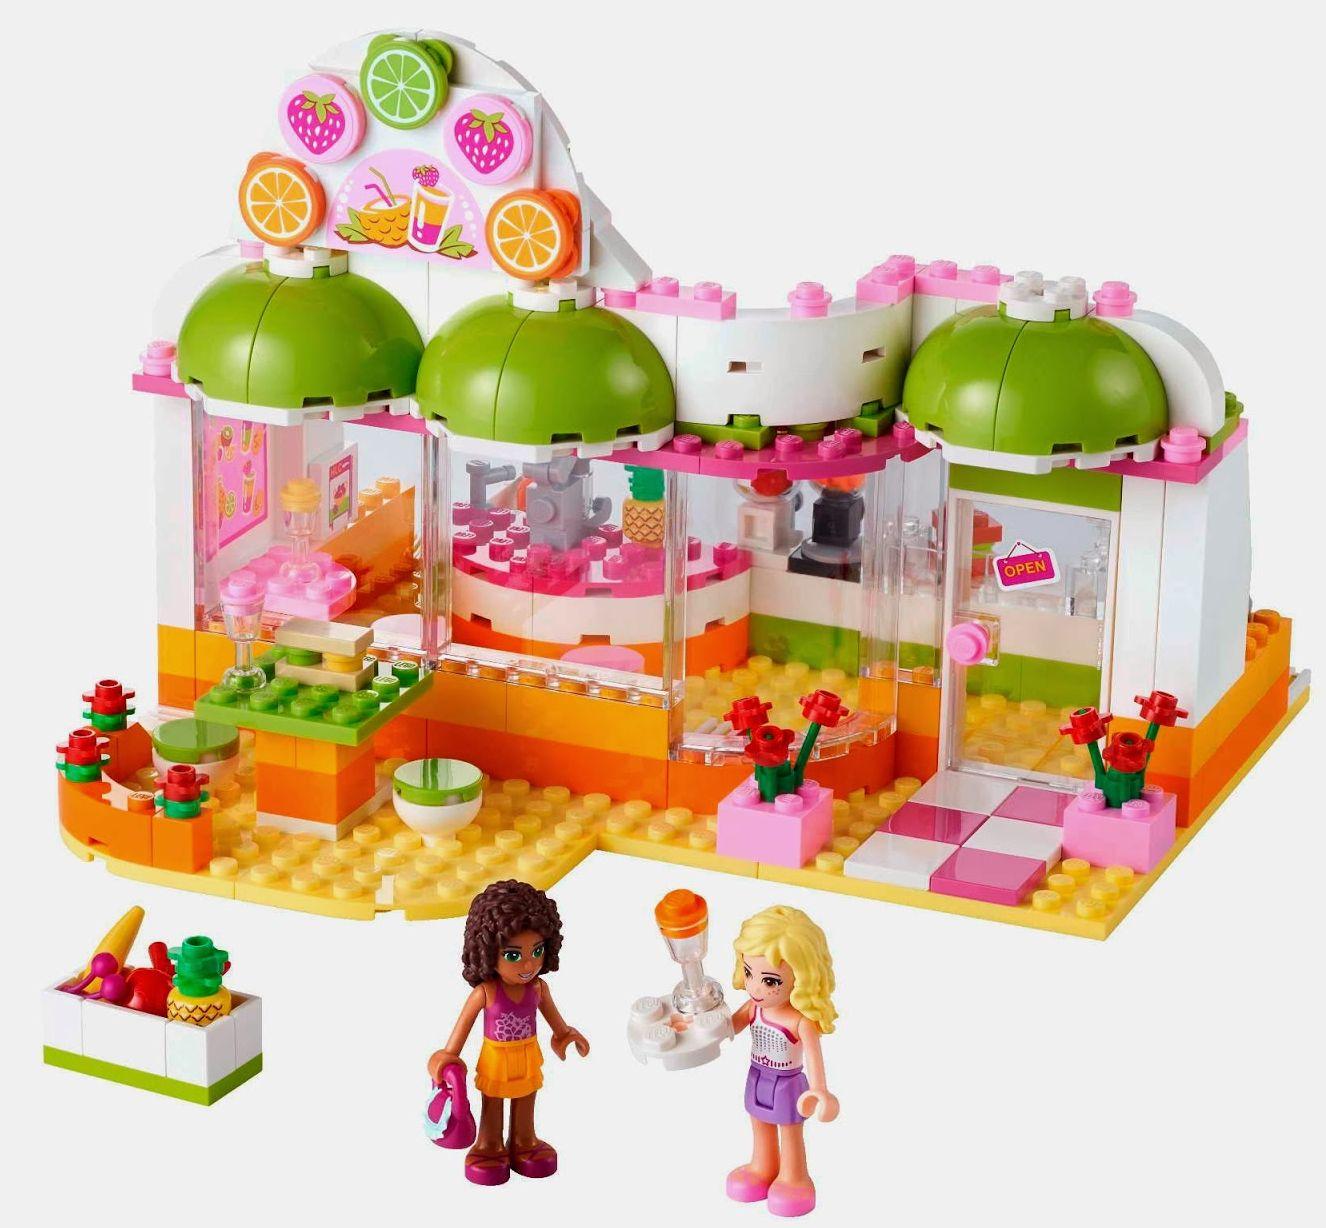 Lego 41035 Heartlake Juice Bar I Brick City